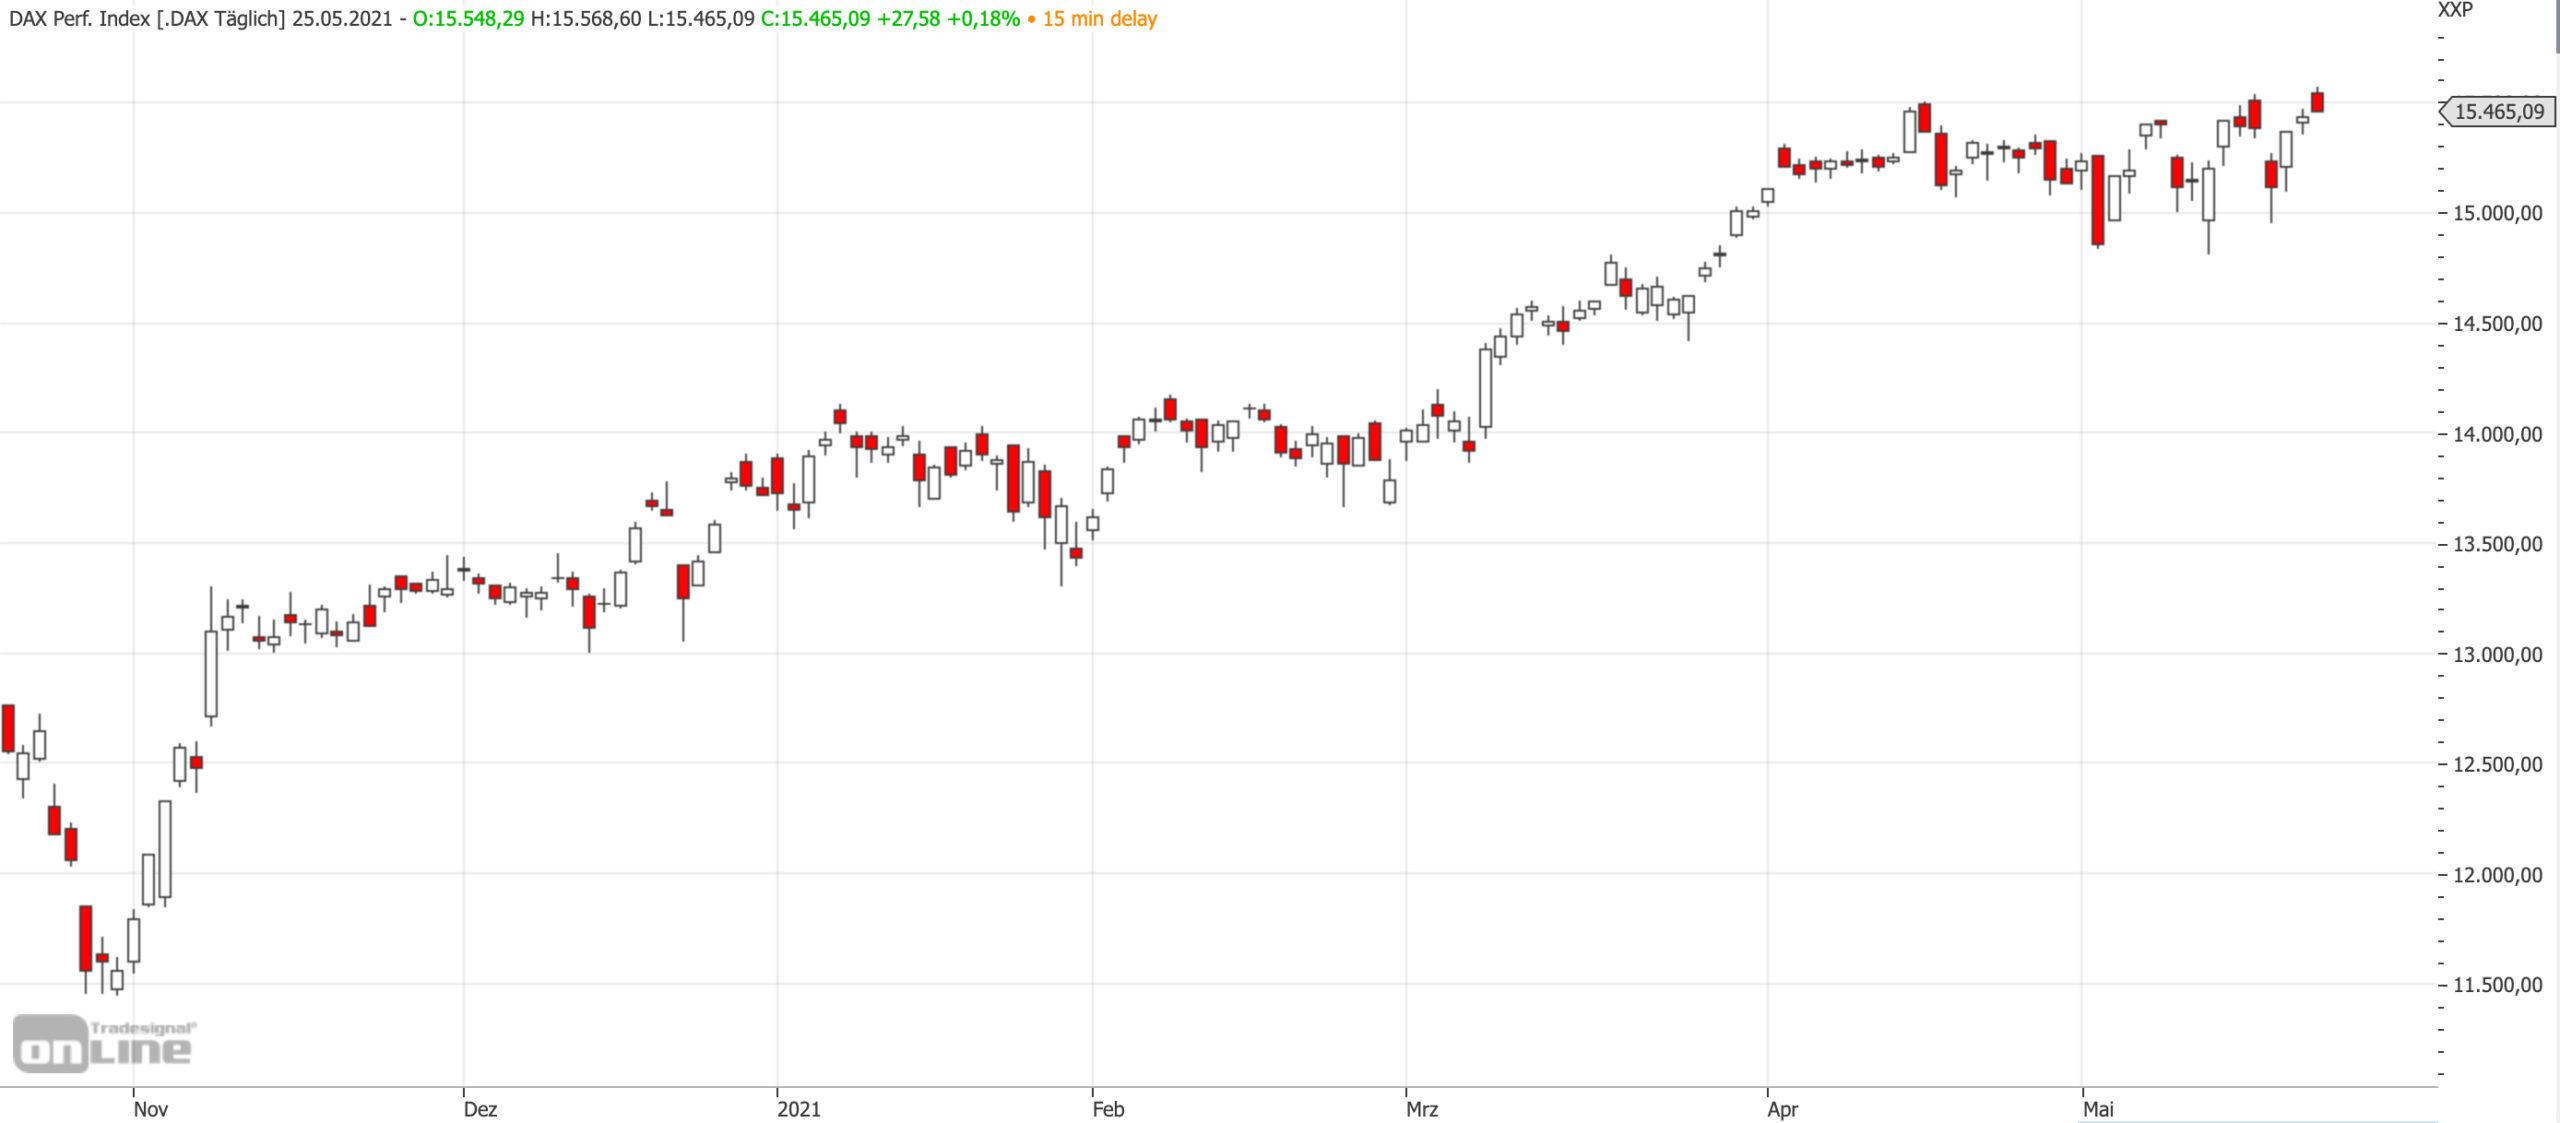 Mittelfristiger DAX-Chart am 25.05.2021